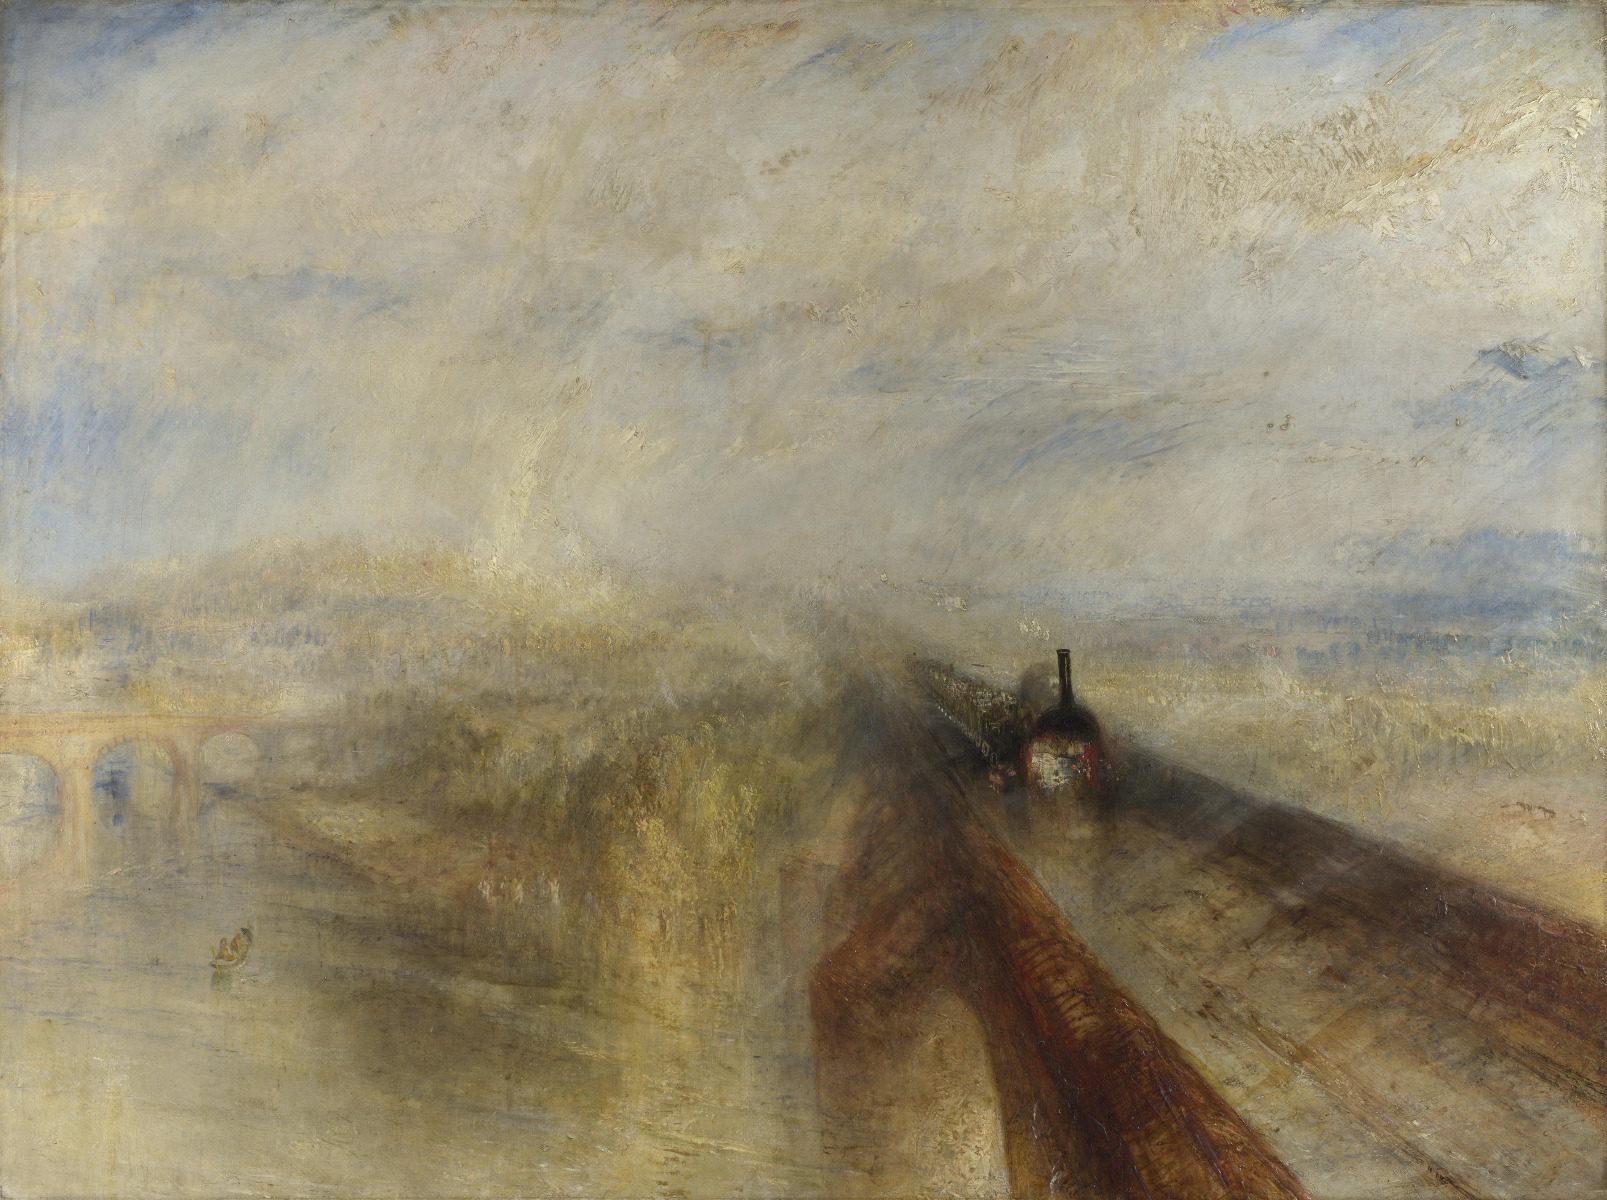 Cinque minuti di meditazione attraverso un'opera di William Turner